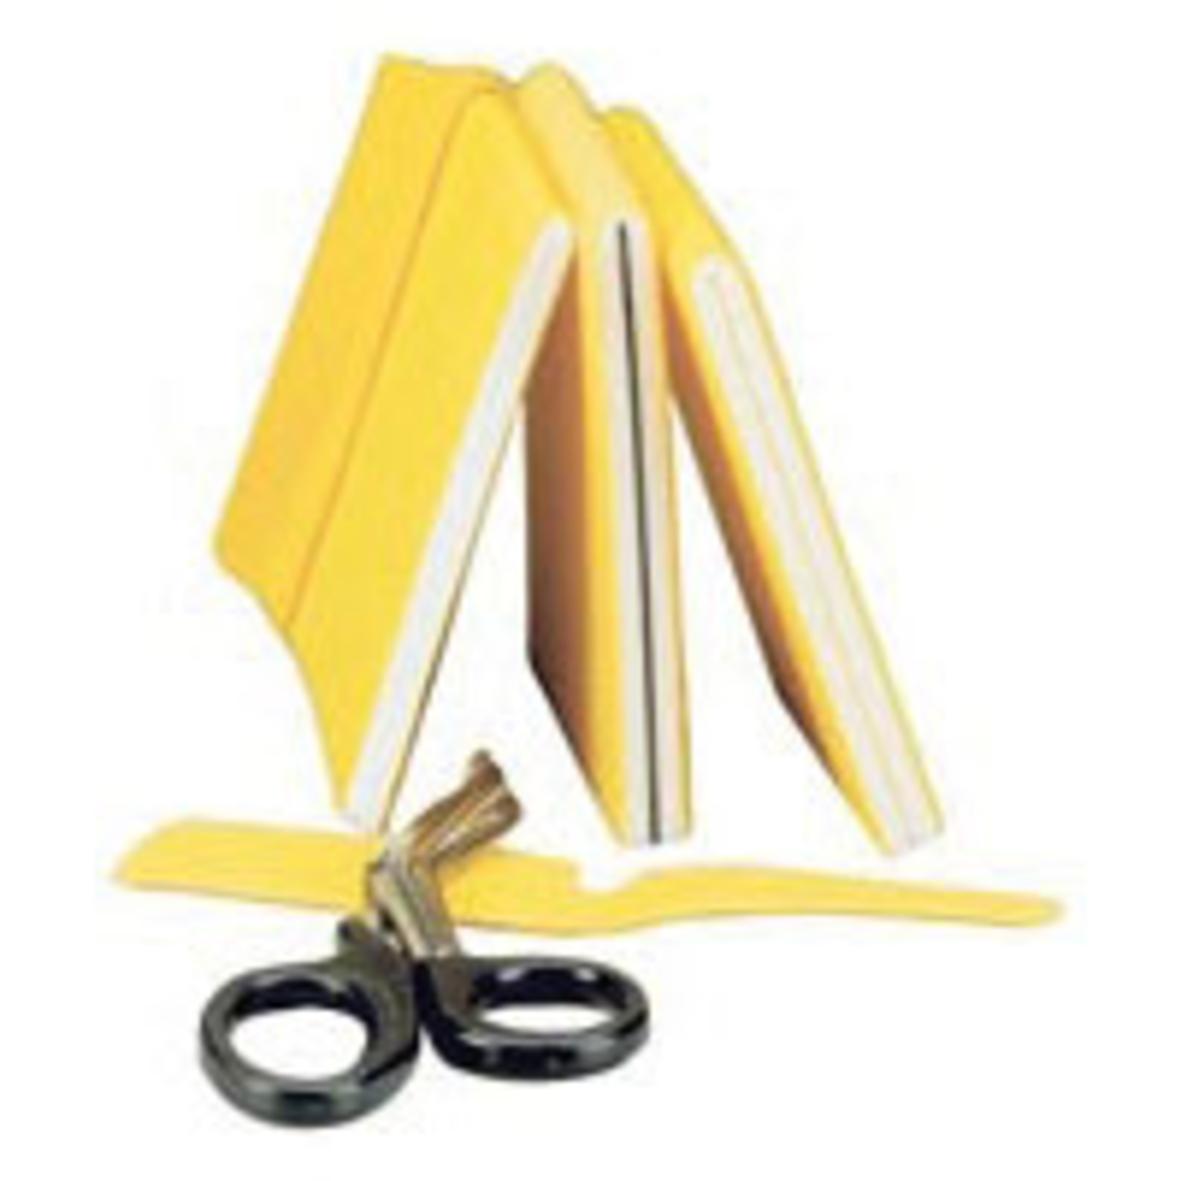 Photo Cases & Bags Kata Bags UK - MODULAR DIVIDER KIT